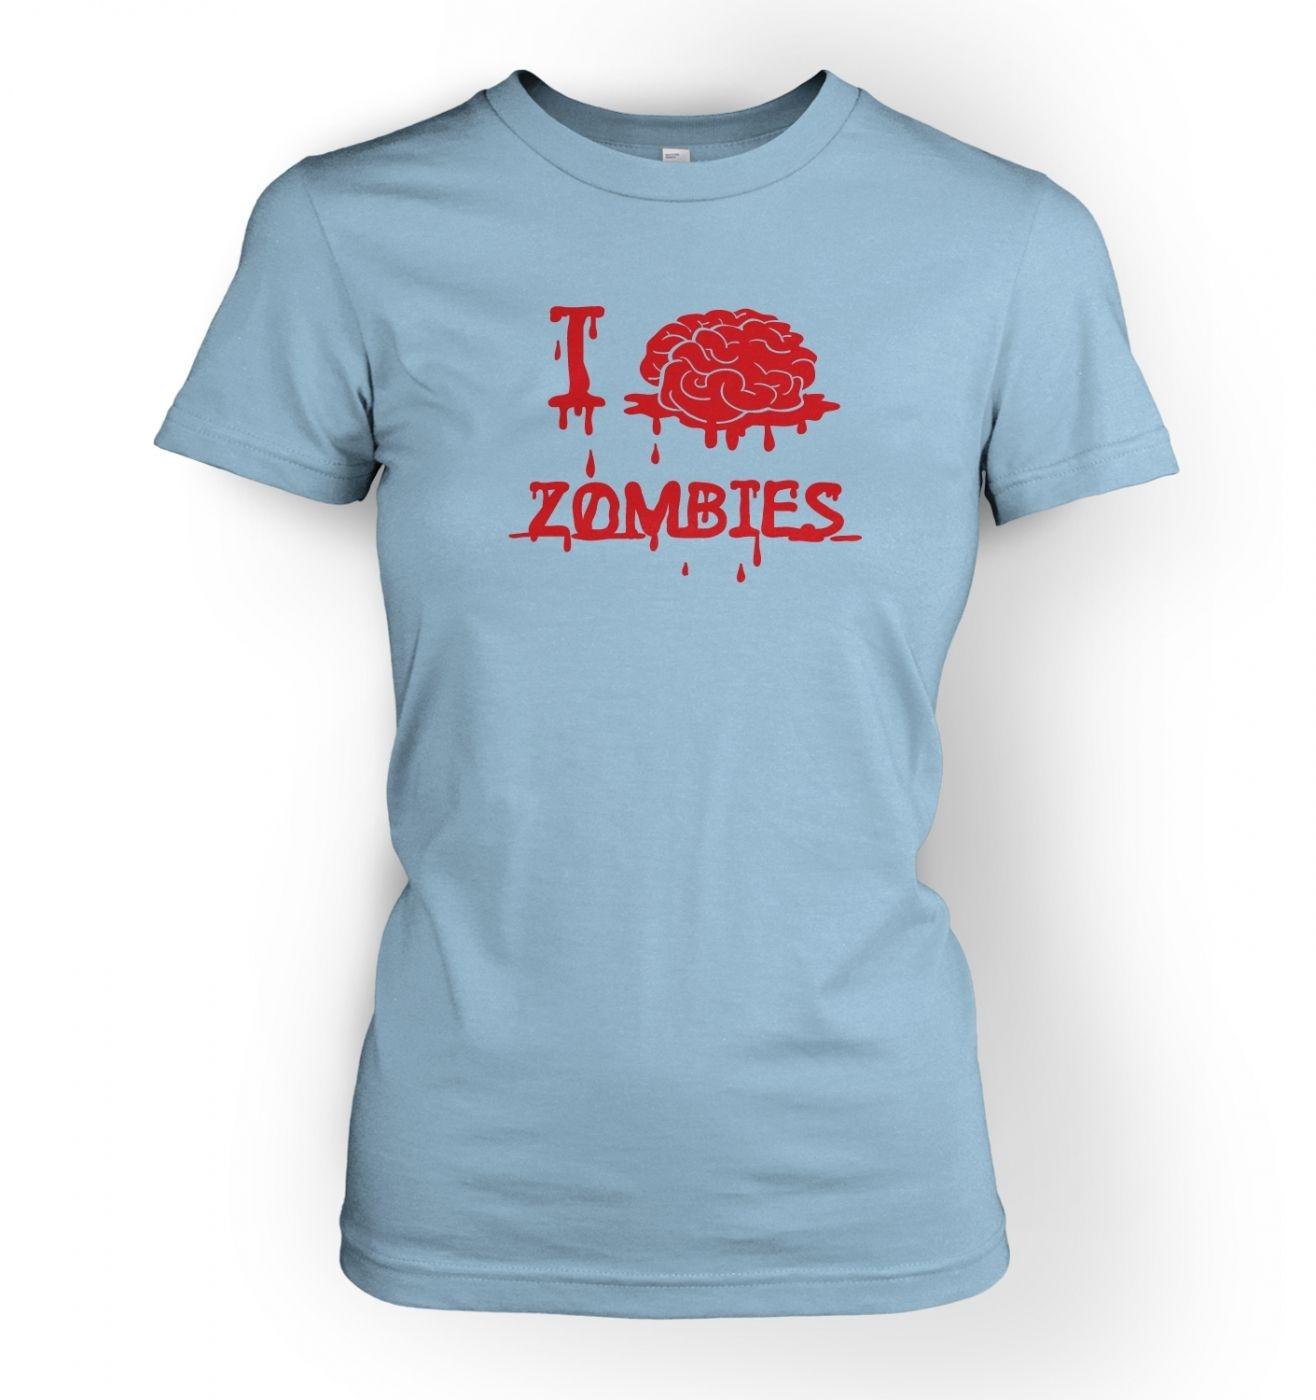 Women's I brain zombies t-shirt